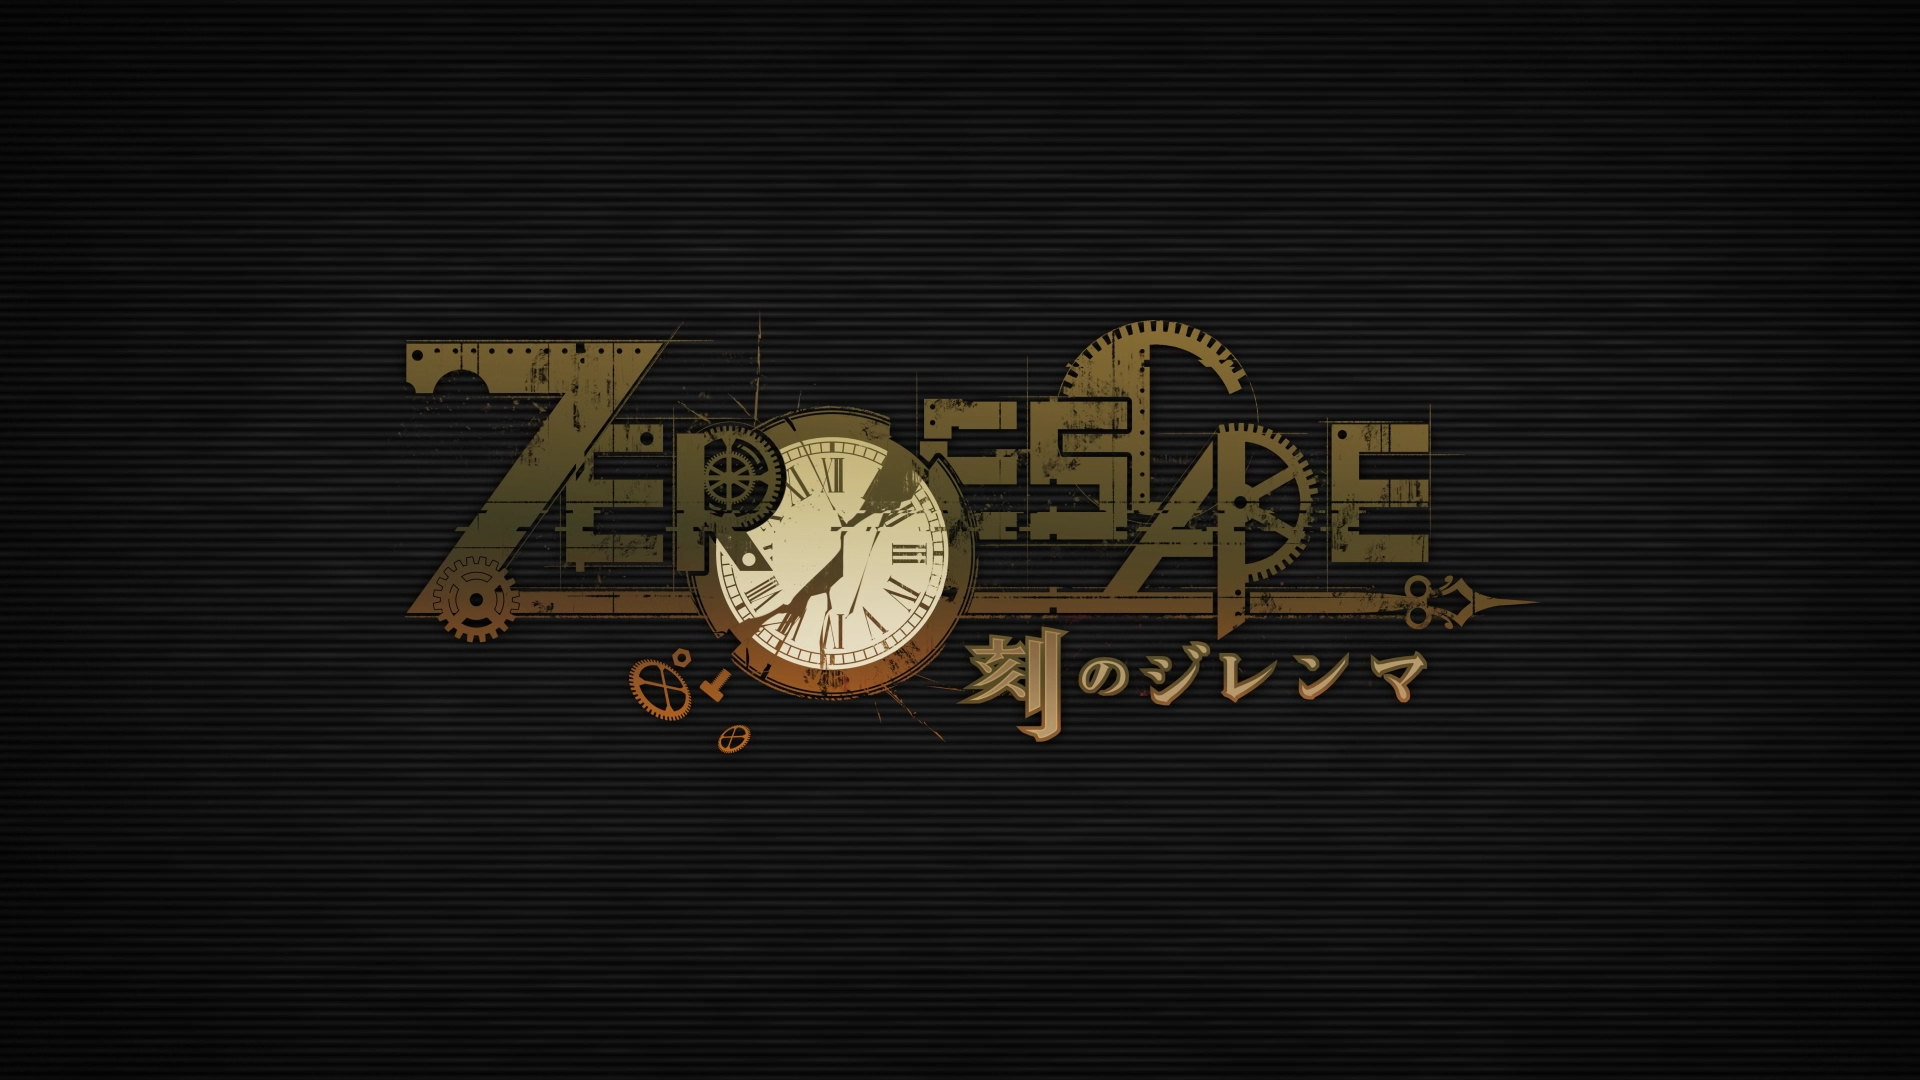 ZERO ESCAPE 刻のジレンマ 3